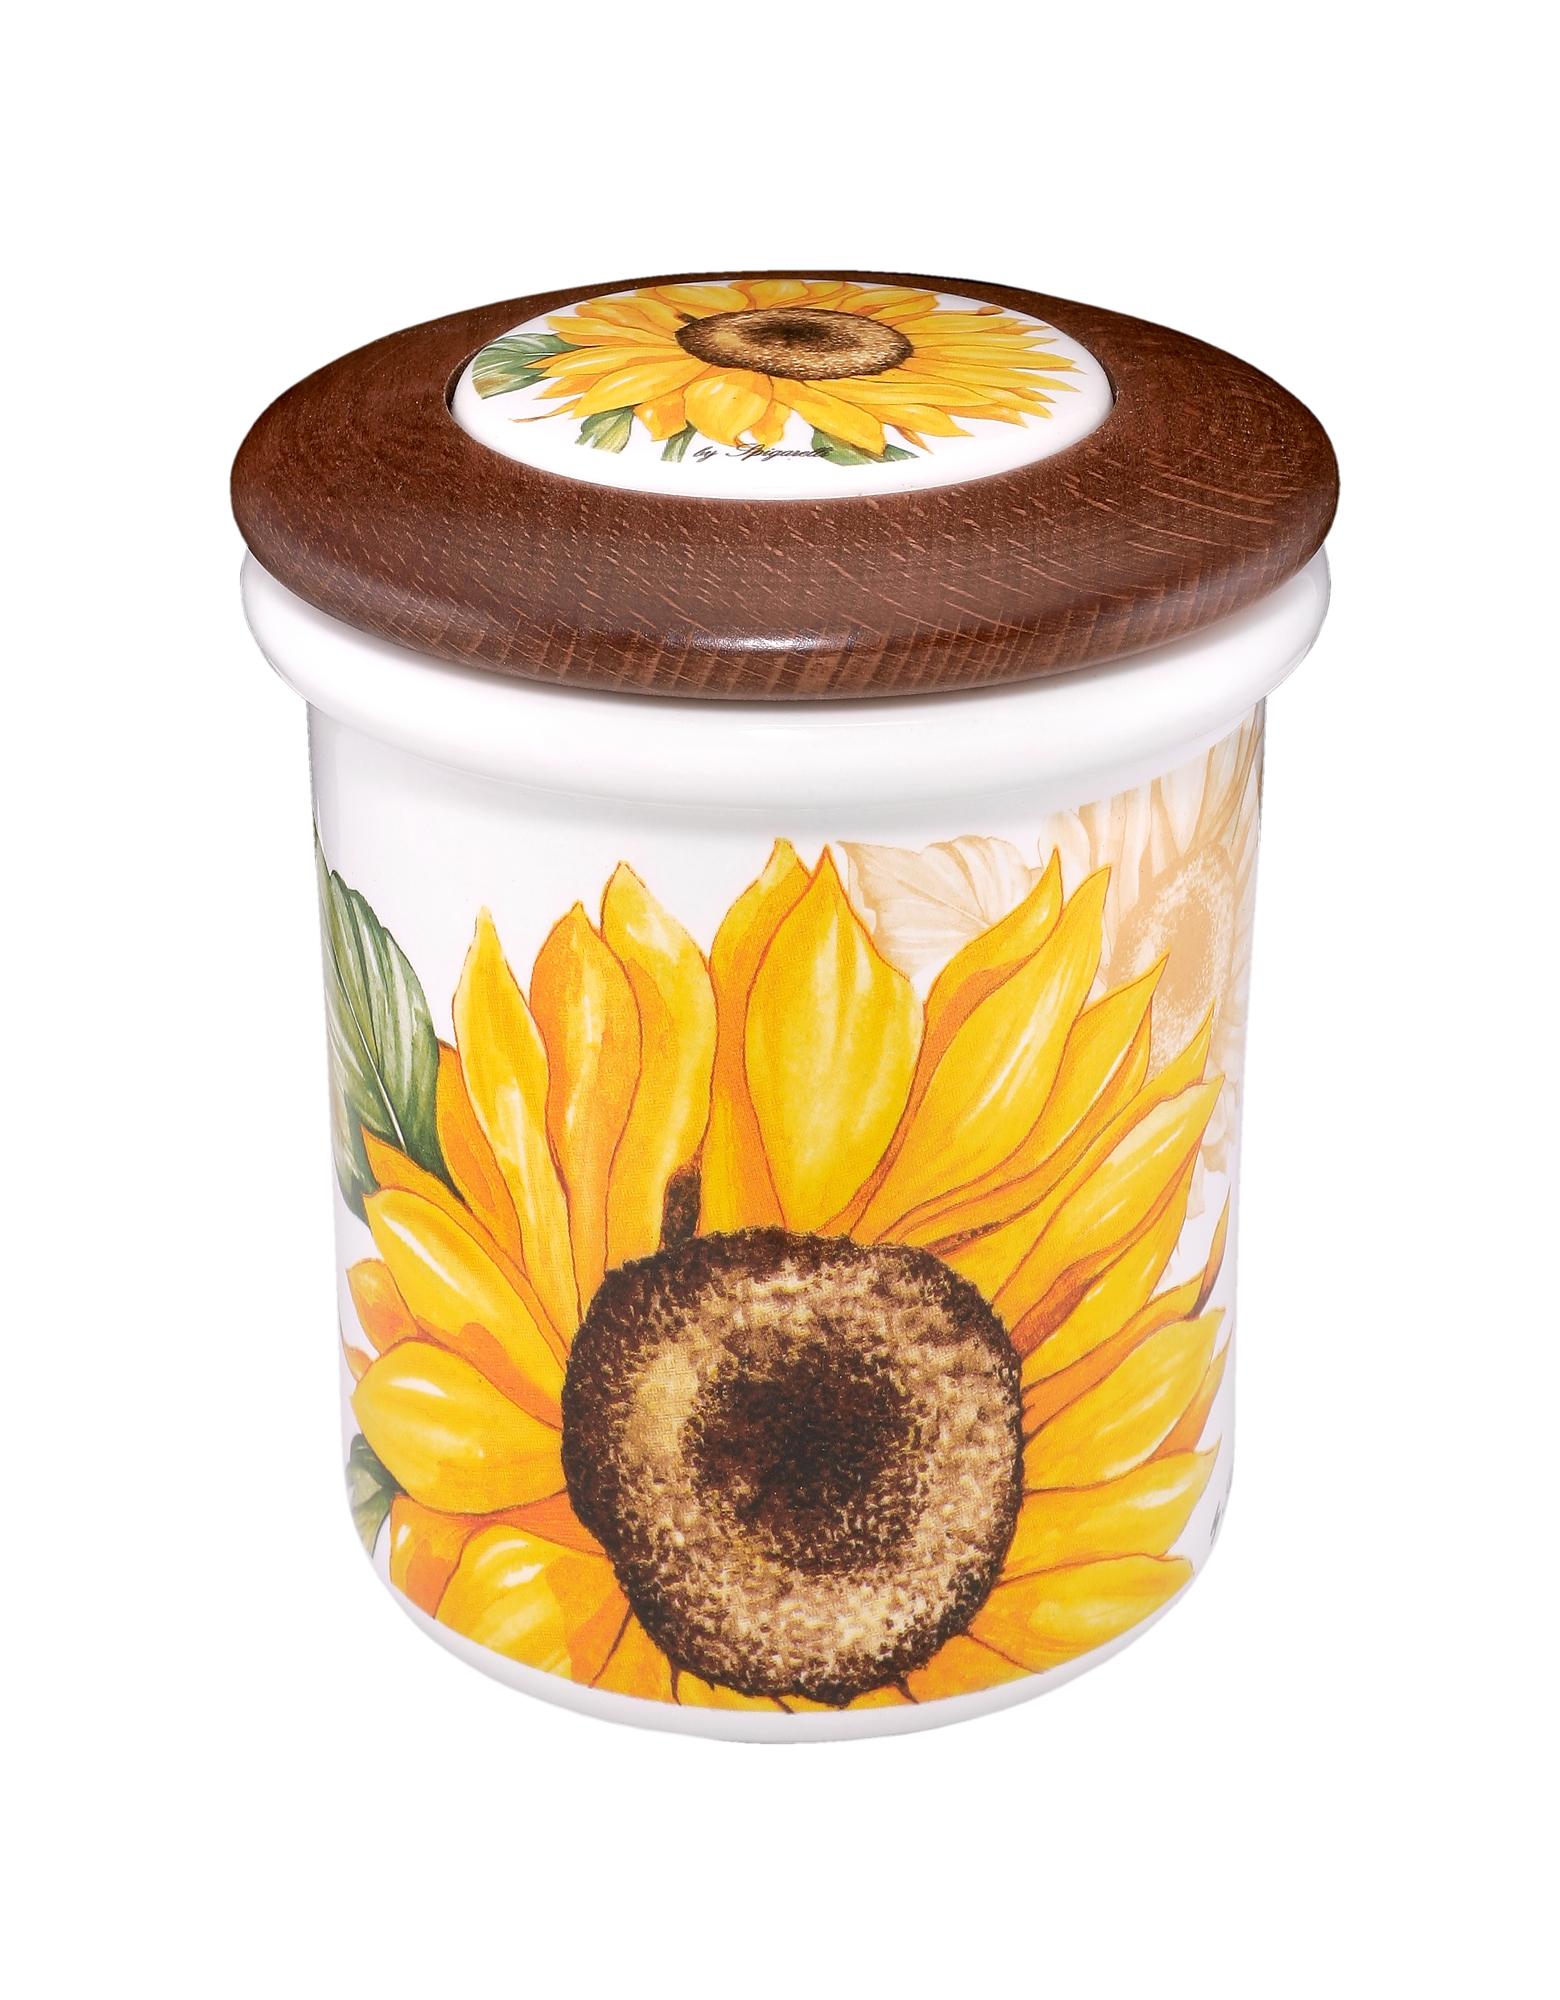 Spigarelli Designer Kitchen & Dining, Sunflower Ceramic and Wood Jar